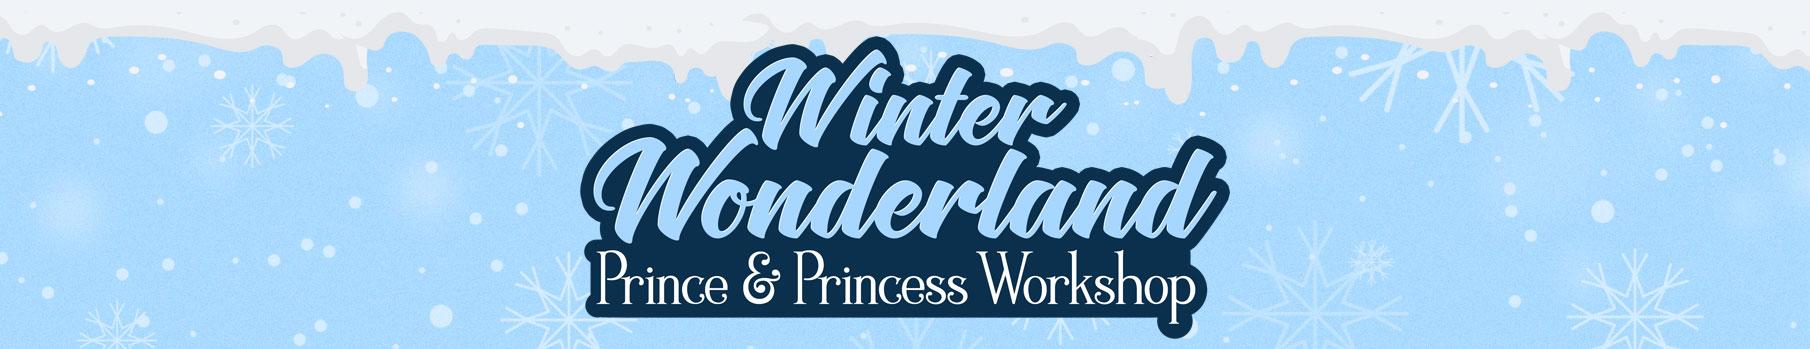 winterwonderland-subhdr-1220